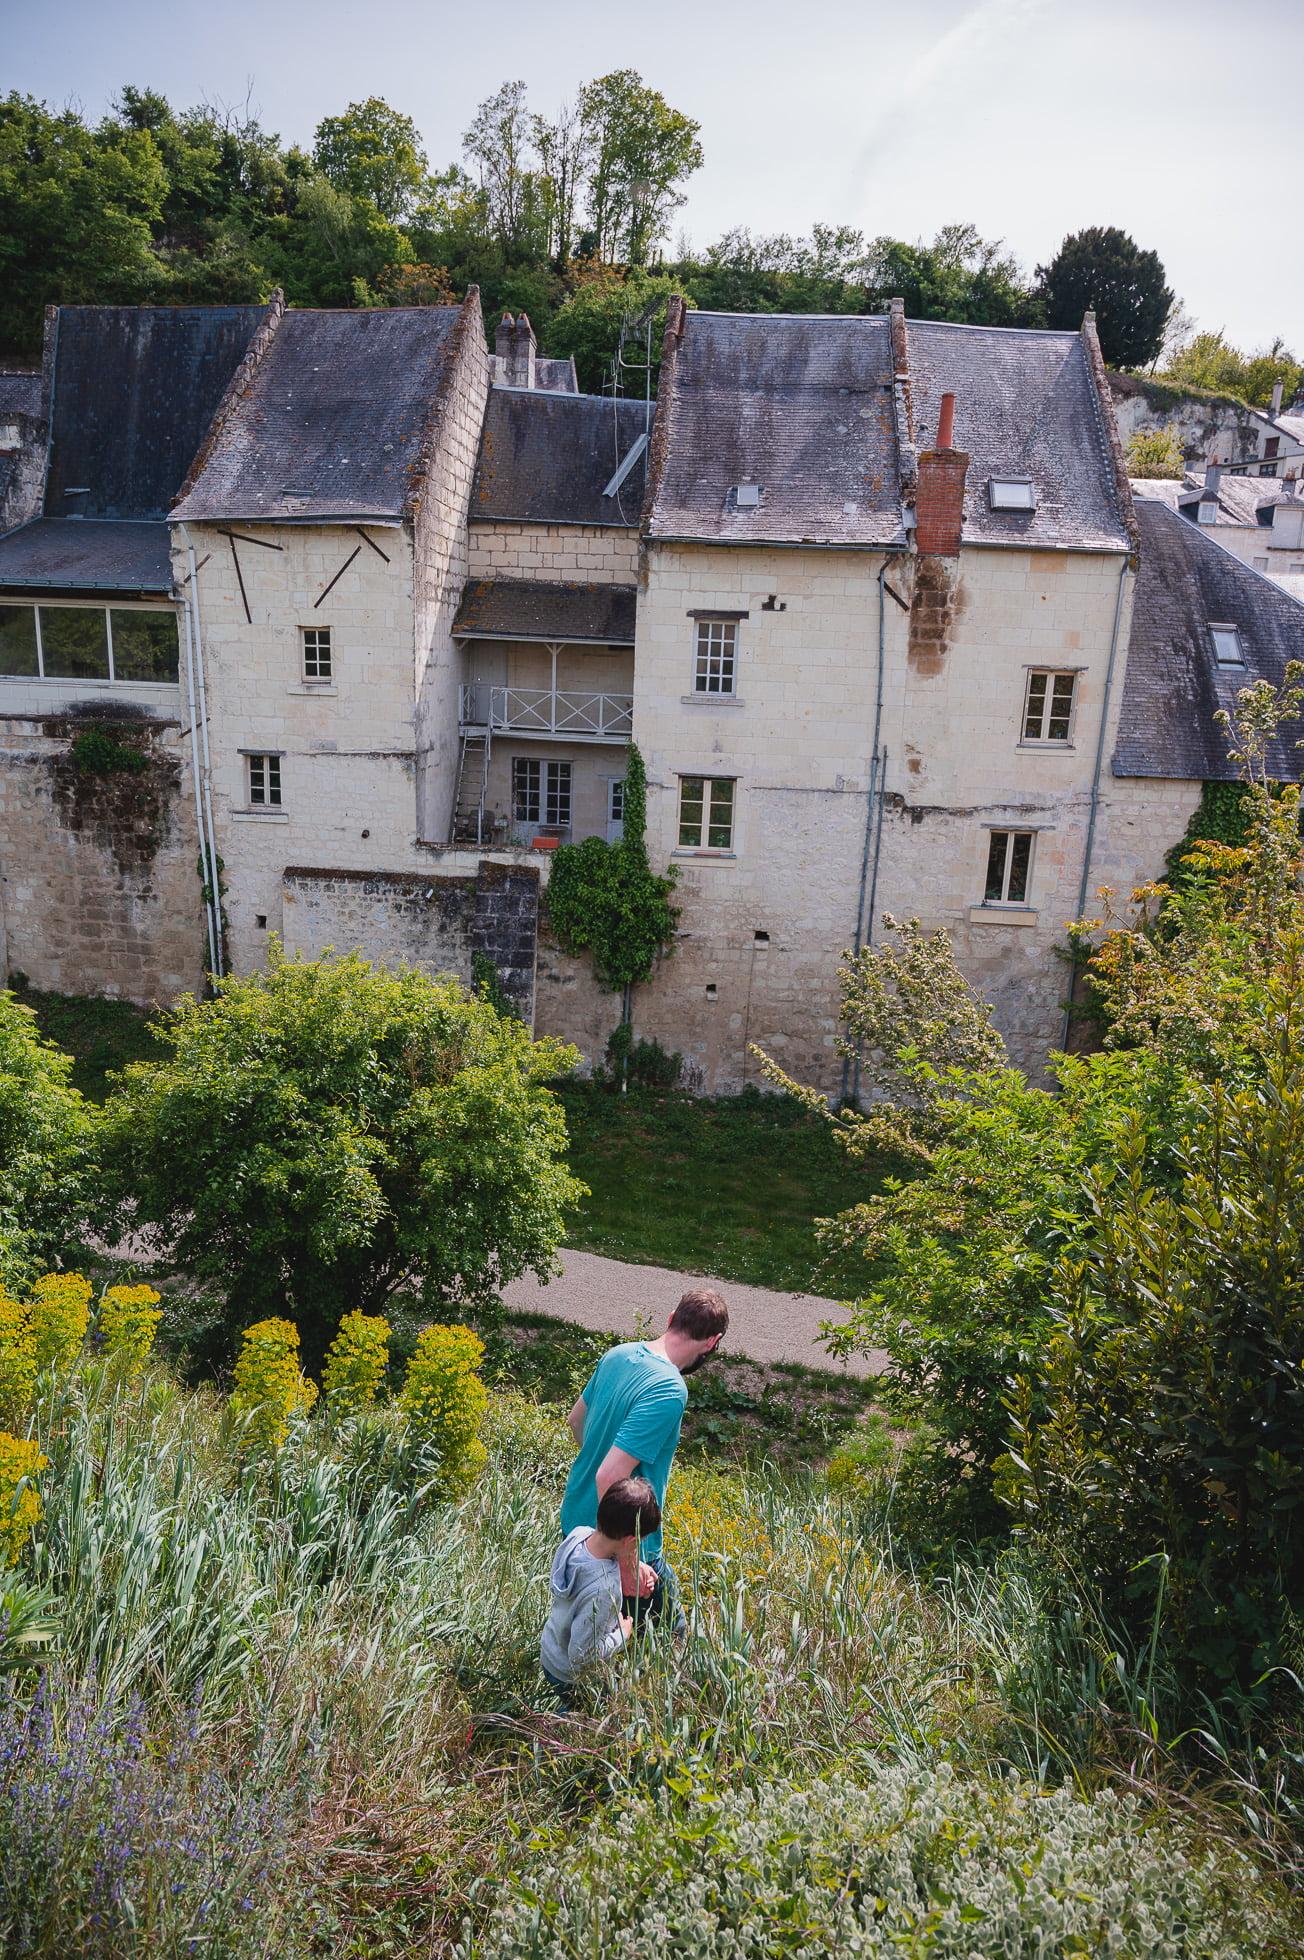 anjou 5927 - Les globe blogueurs - blog voyage nature